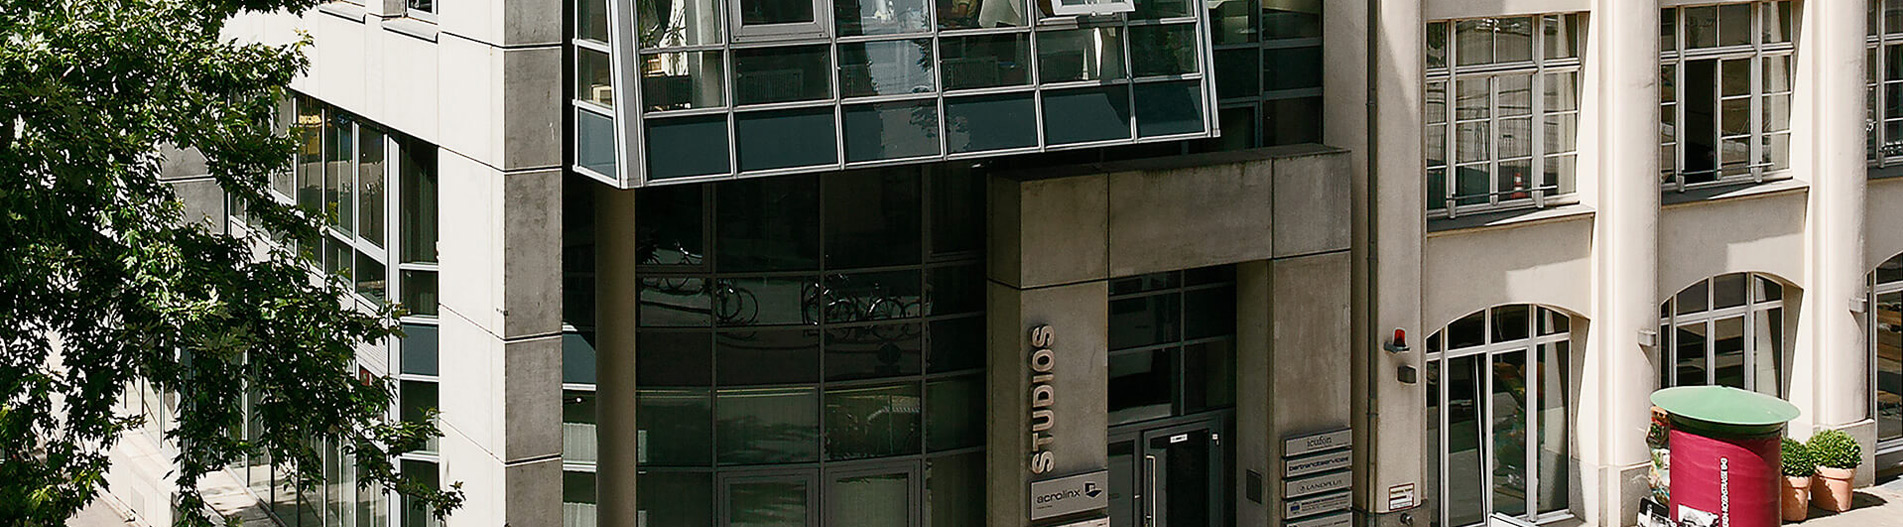 Büros in Berlin Mitte mieten